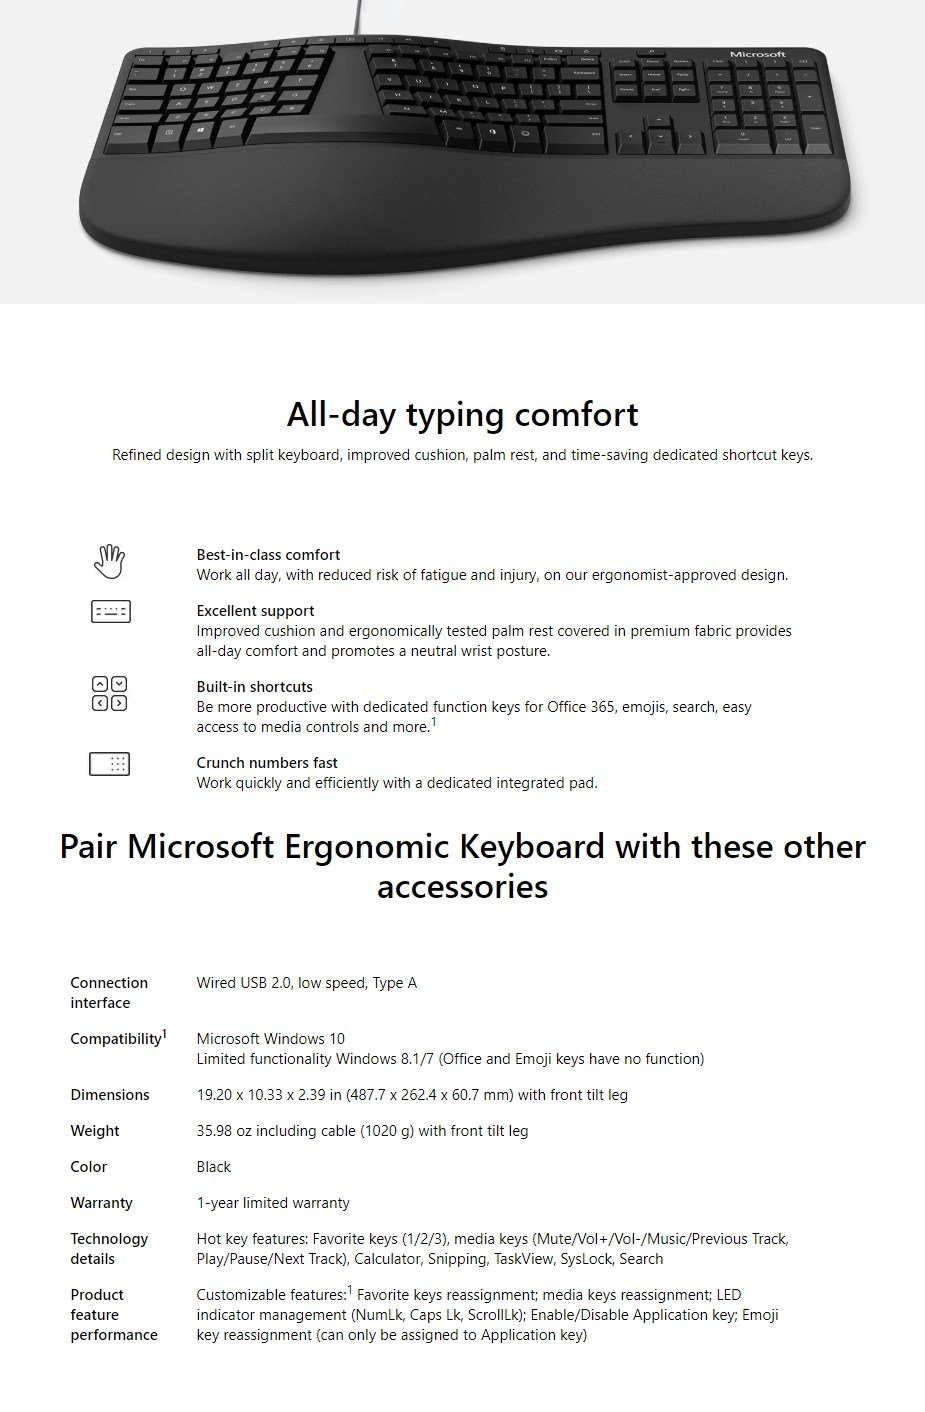 microsoft_ergonomic_keyboard_black_ac31952.jpg